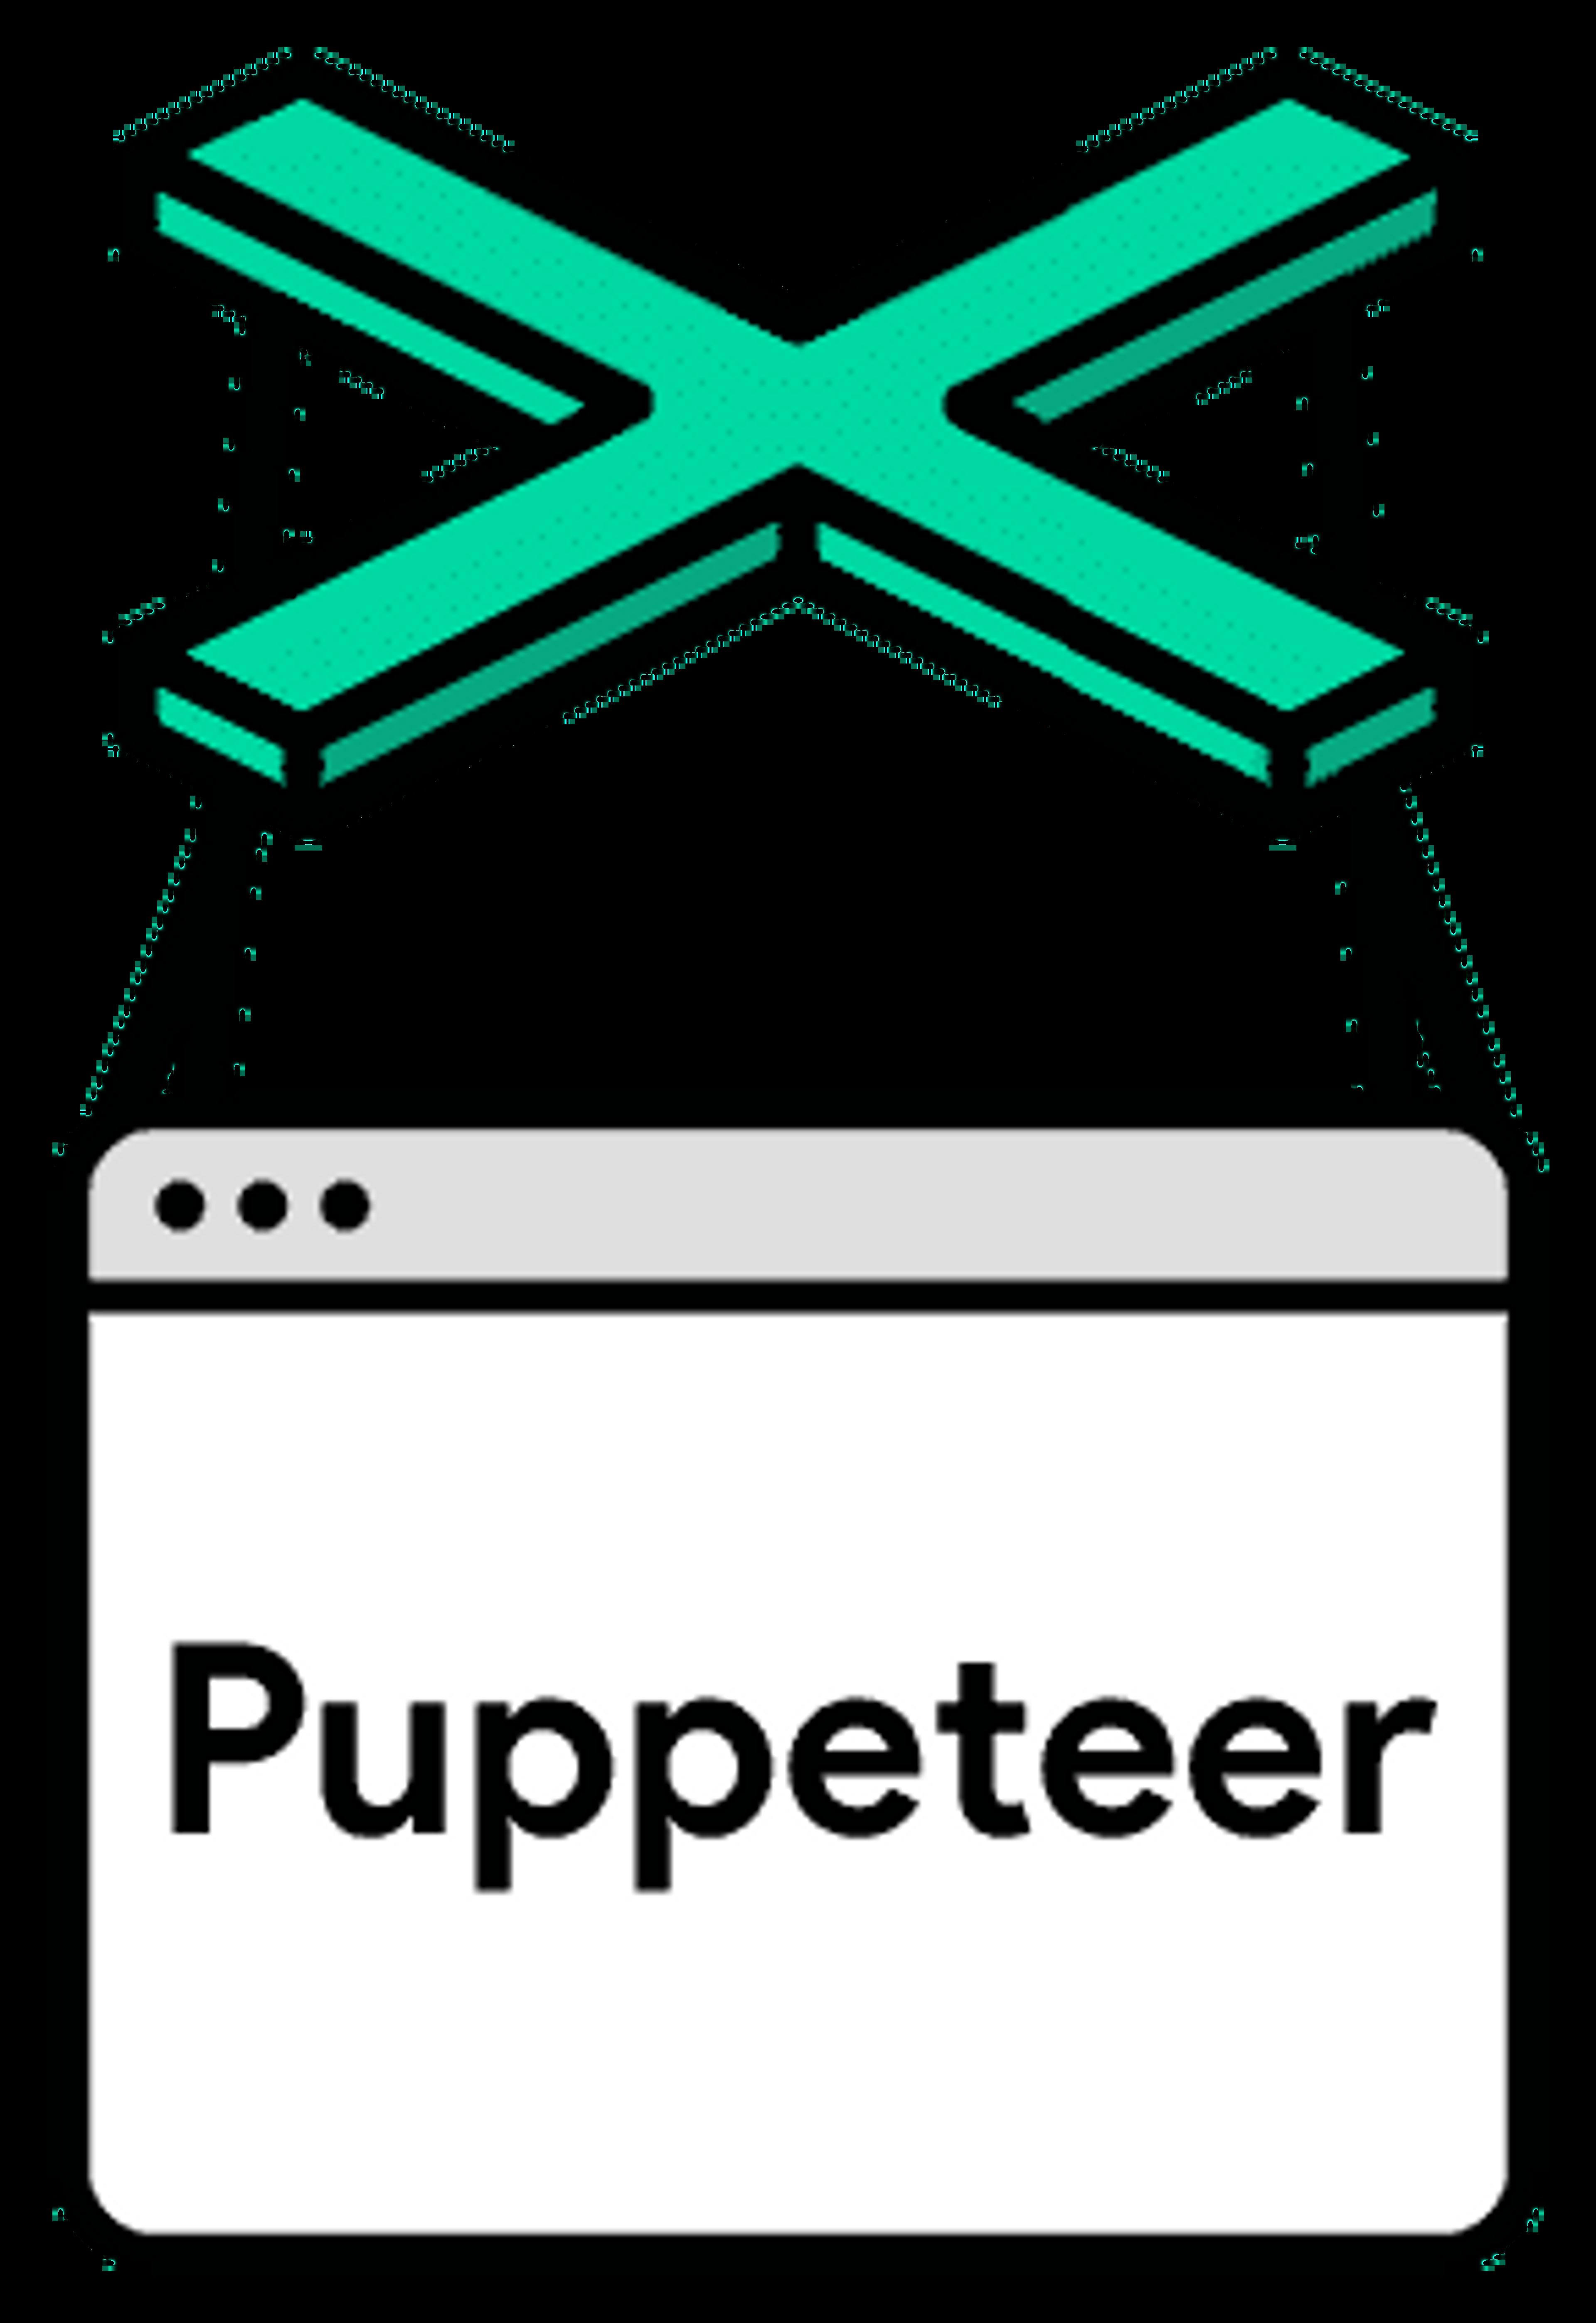 Web scrapping en NodeJS avec le navigateur headless Puppeteer